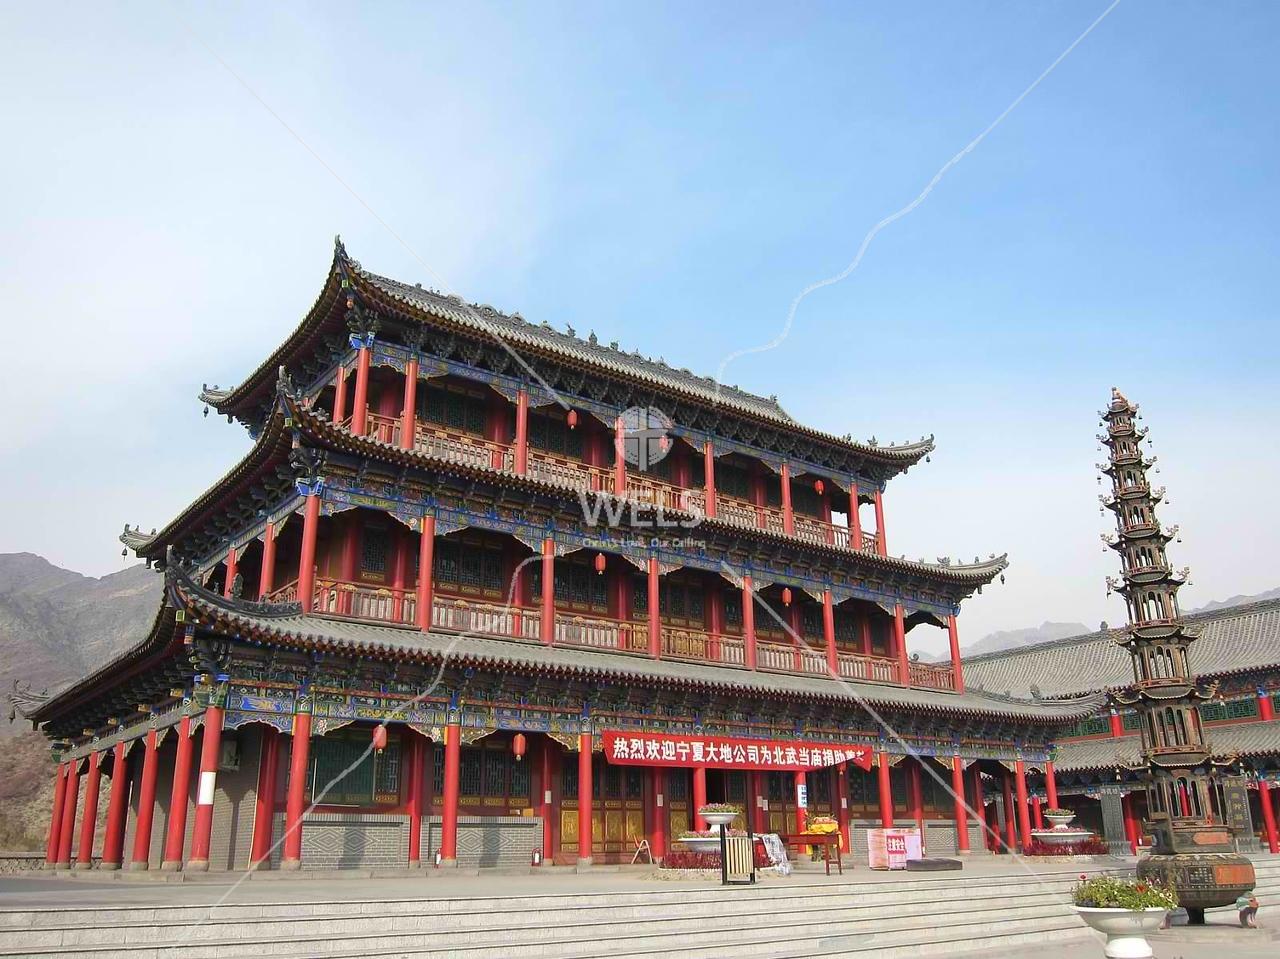 Buddhist temple in Ningxia Dawukou China by kstellick